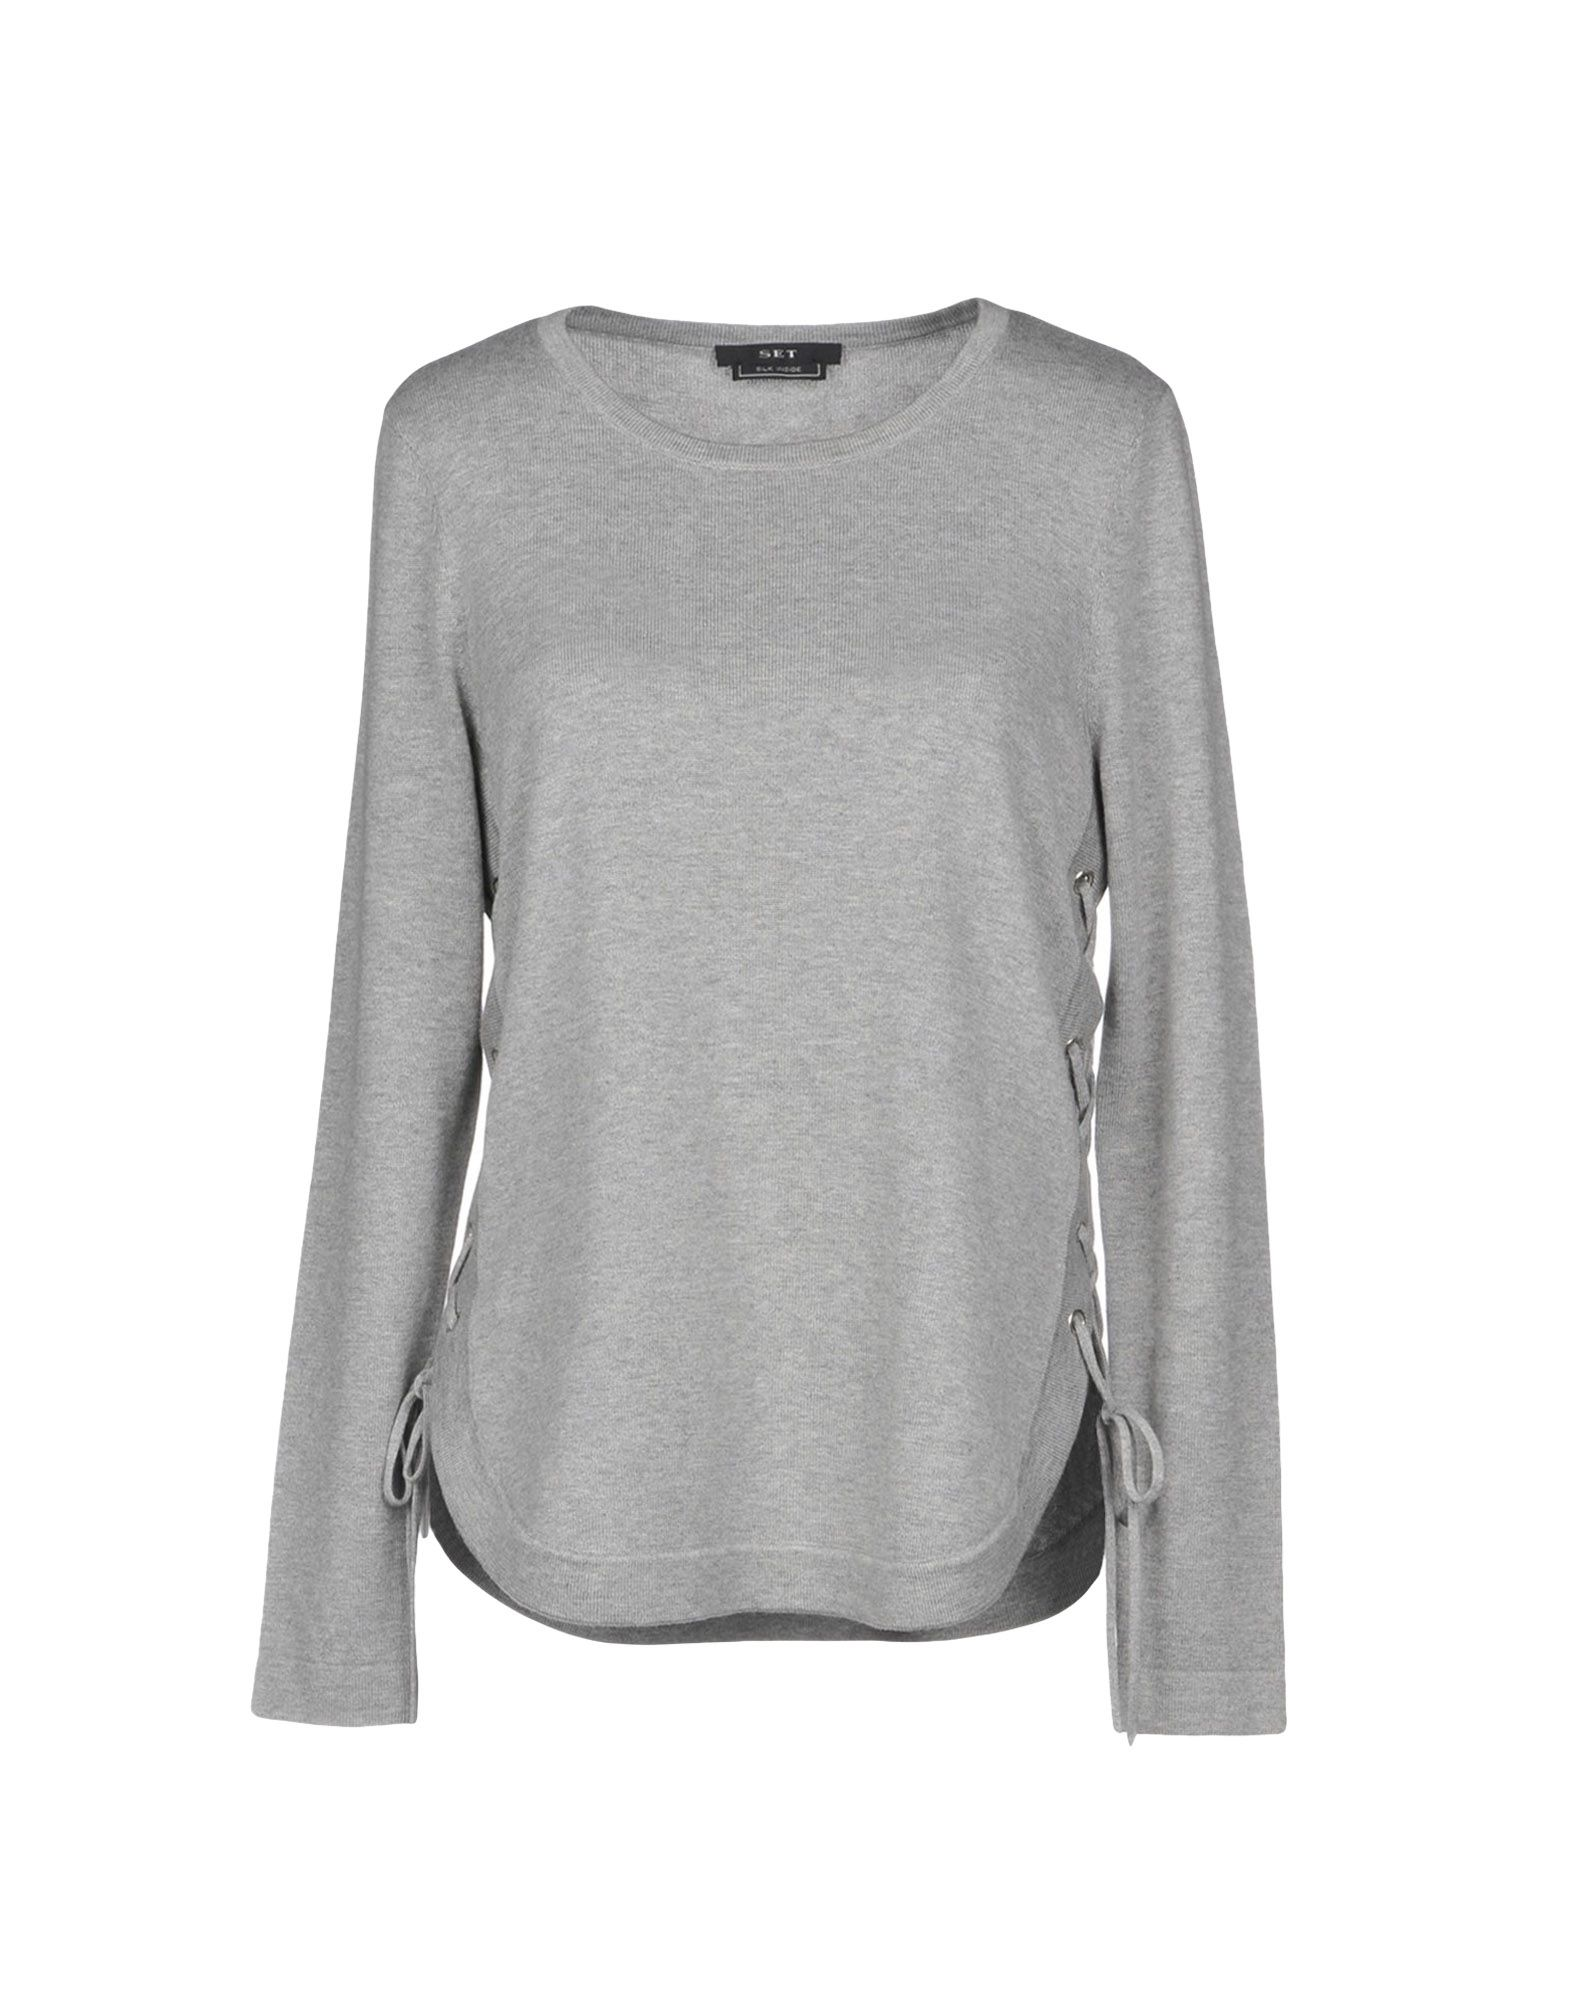 SET Sweater in Light Grey